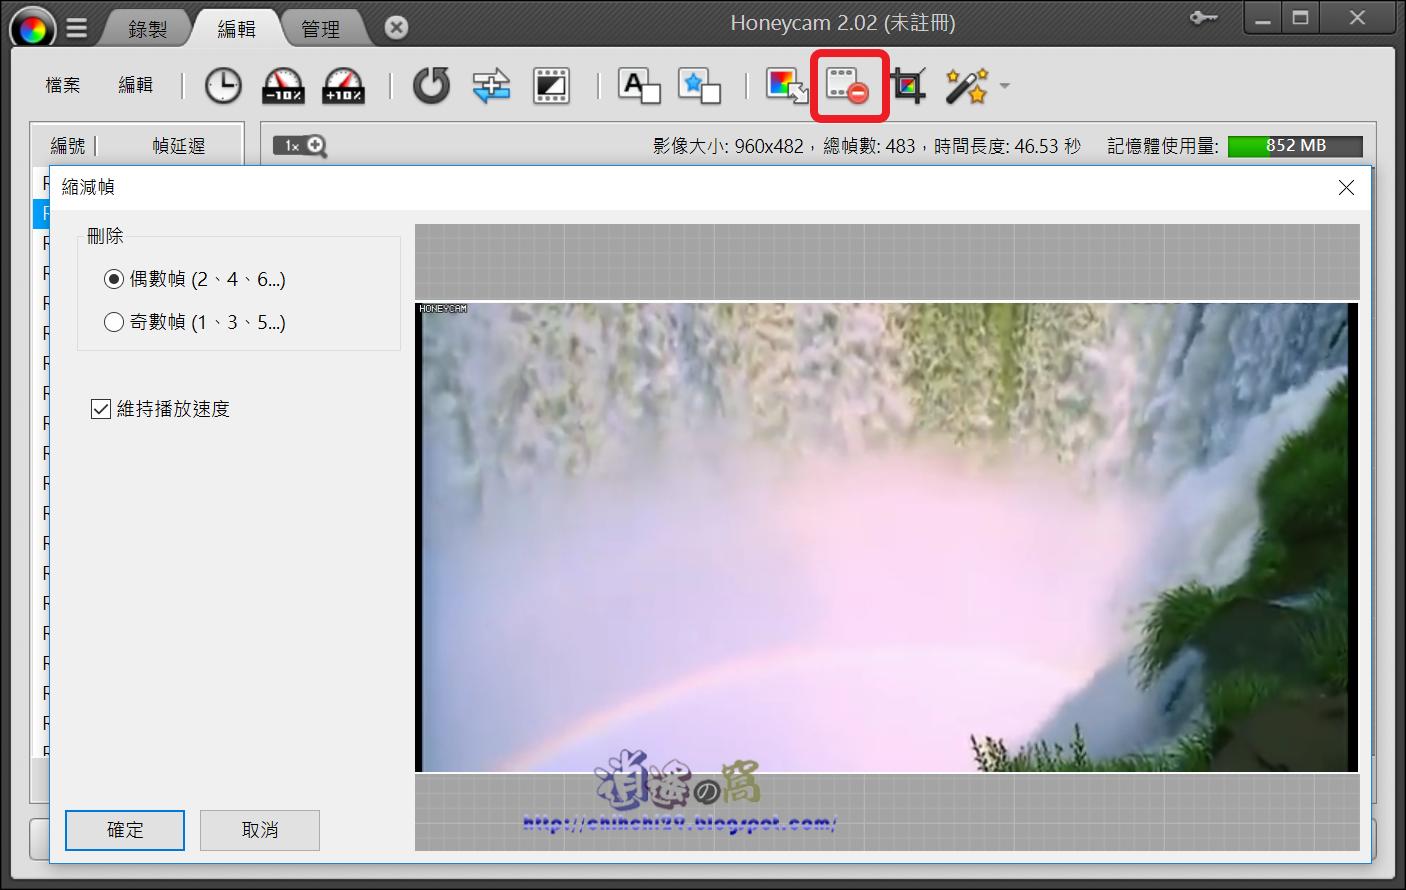 Honeycam 用錄影、圖片製作動畫圖檔